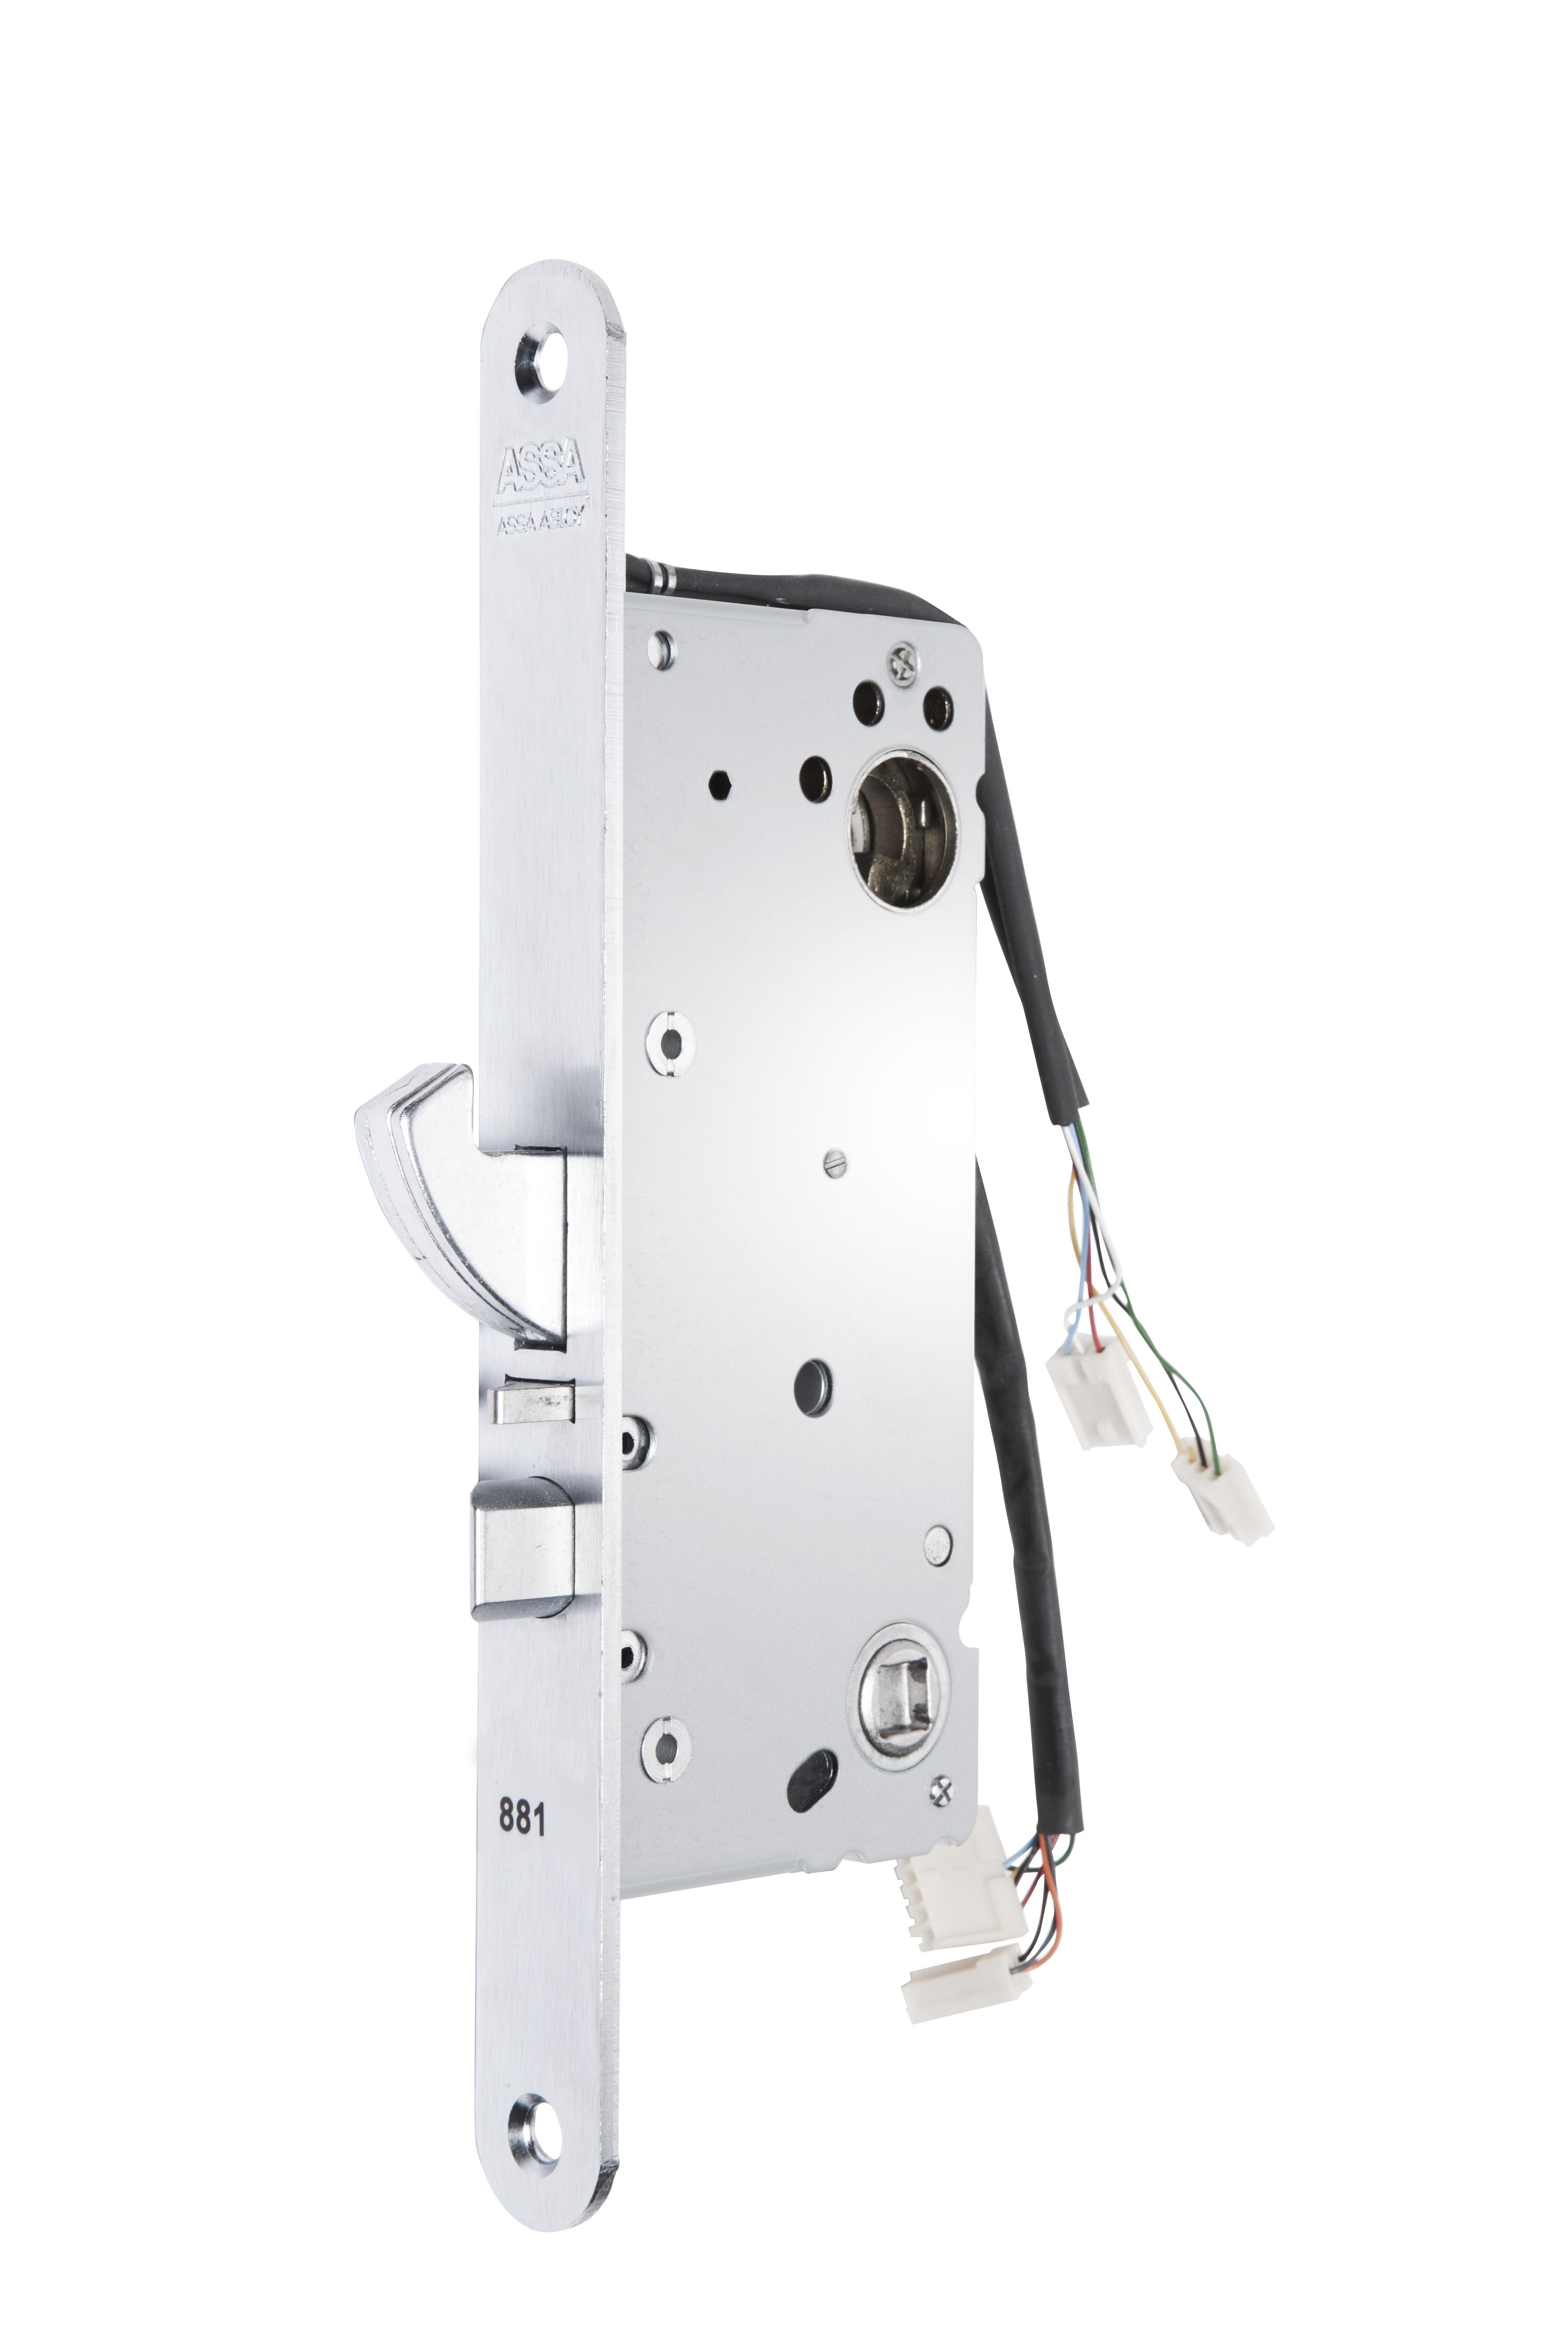 881 - 881 sash lock